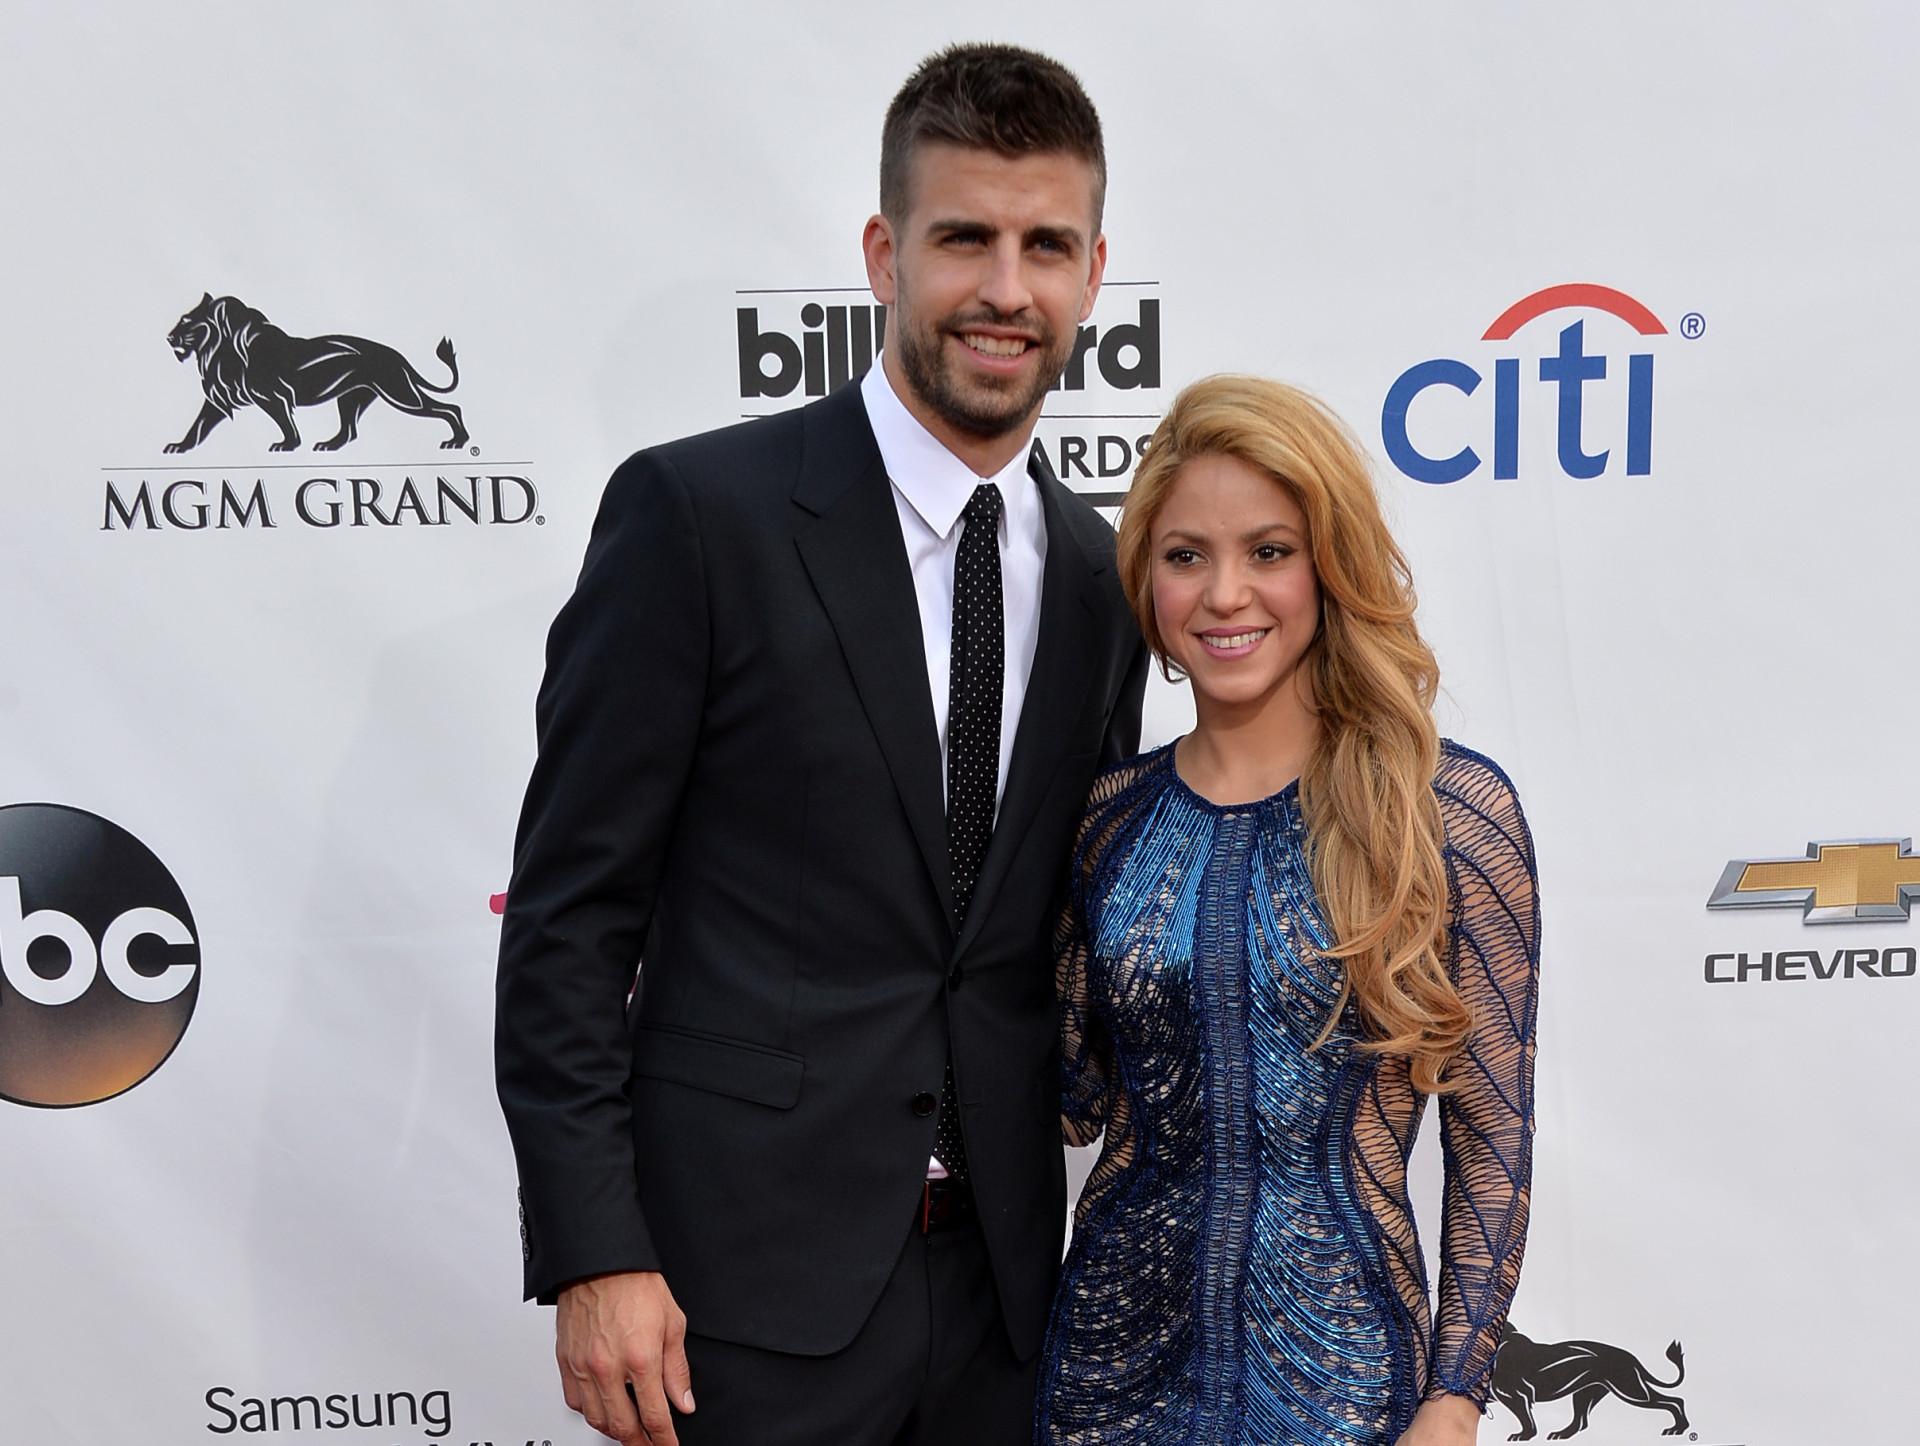 Os casais mais bonitos da atualidade entre as celebridades